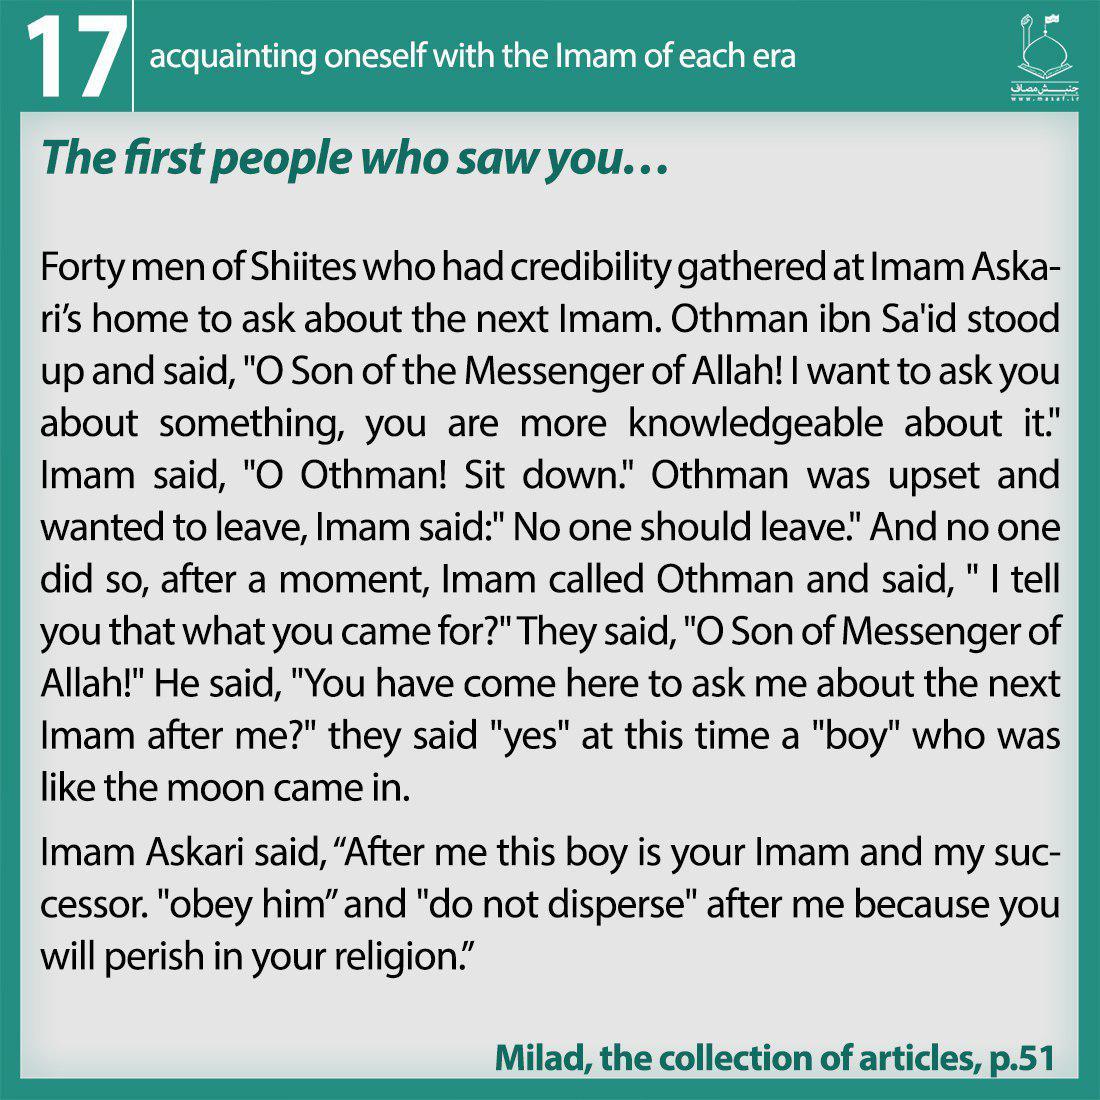 12th imam , 12th imam prophecy . imam mahdi , who is 12th imam , hidden imam,12th imam birth,where is 12th imam